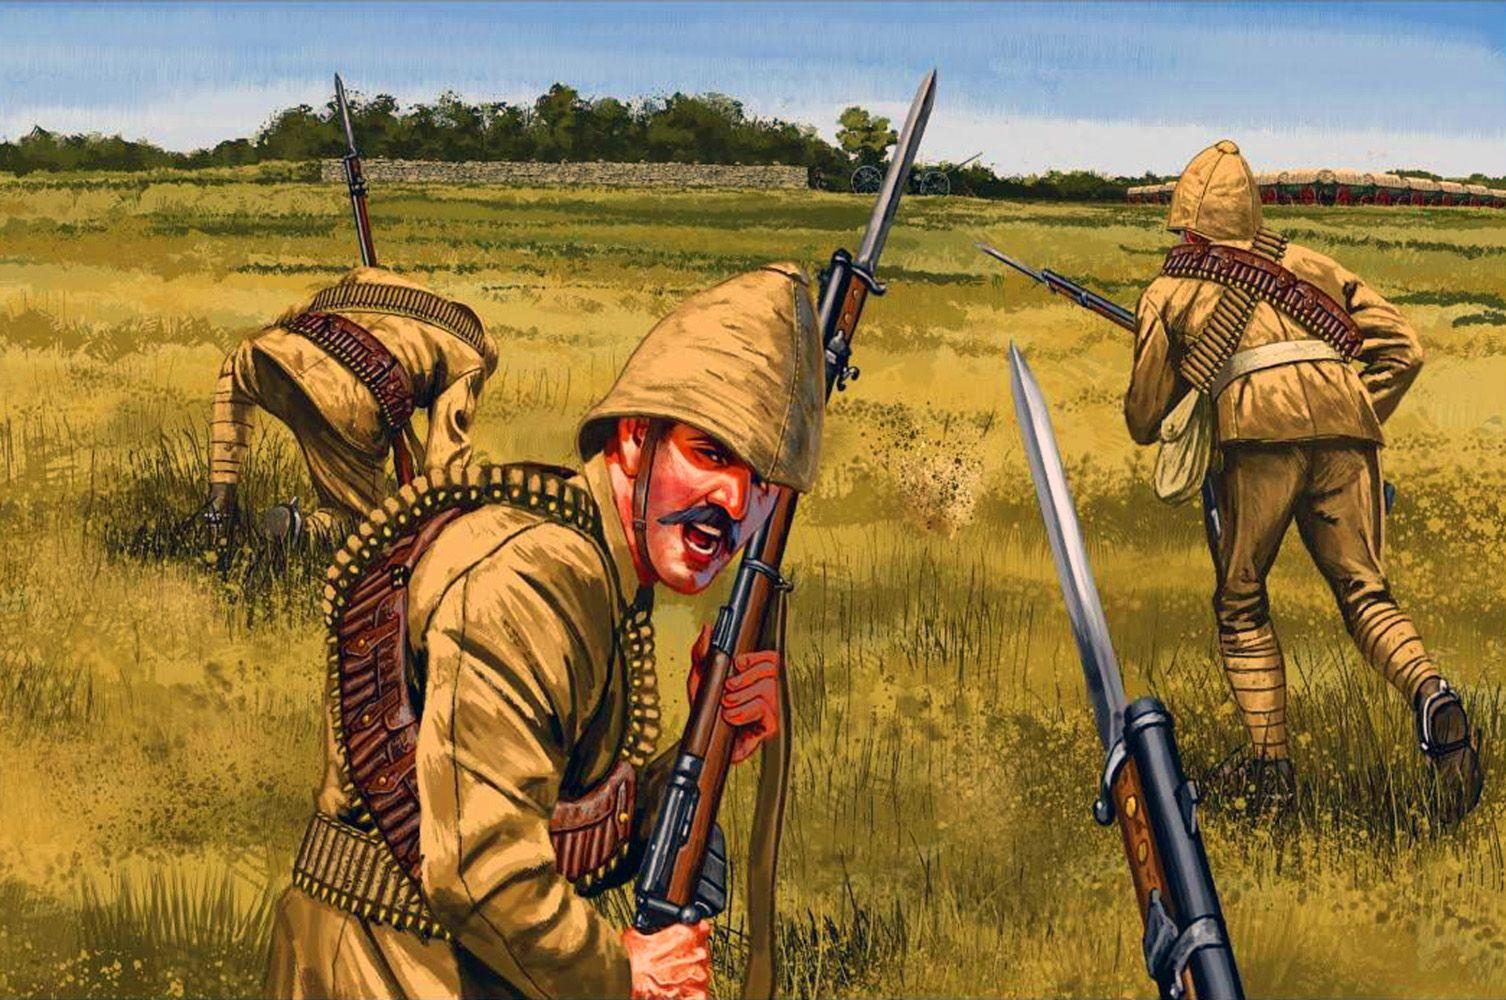 British troops in battle, Boer War Military illustration